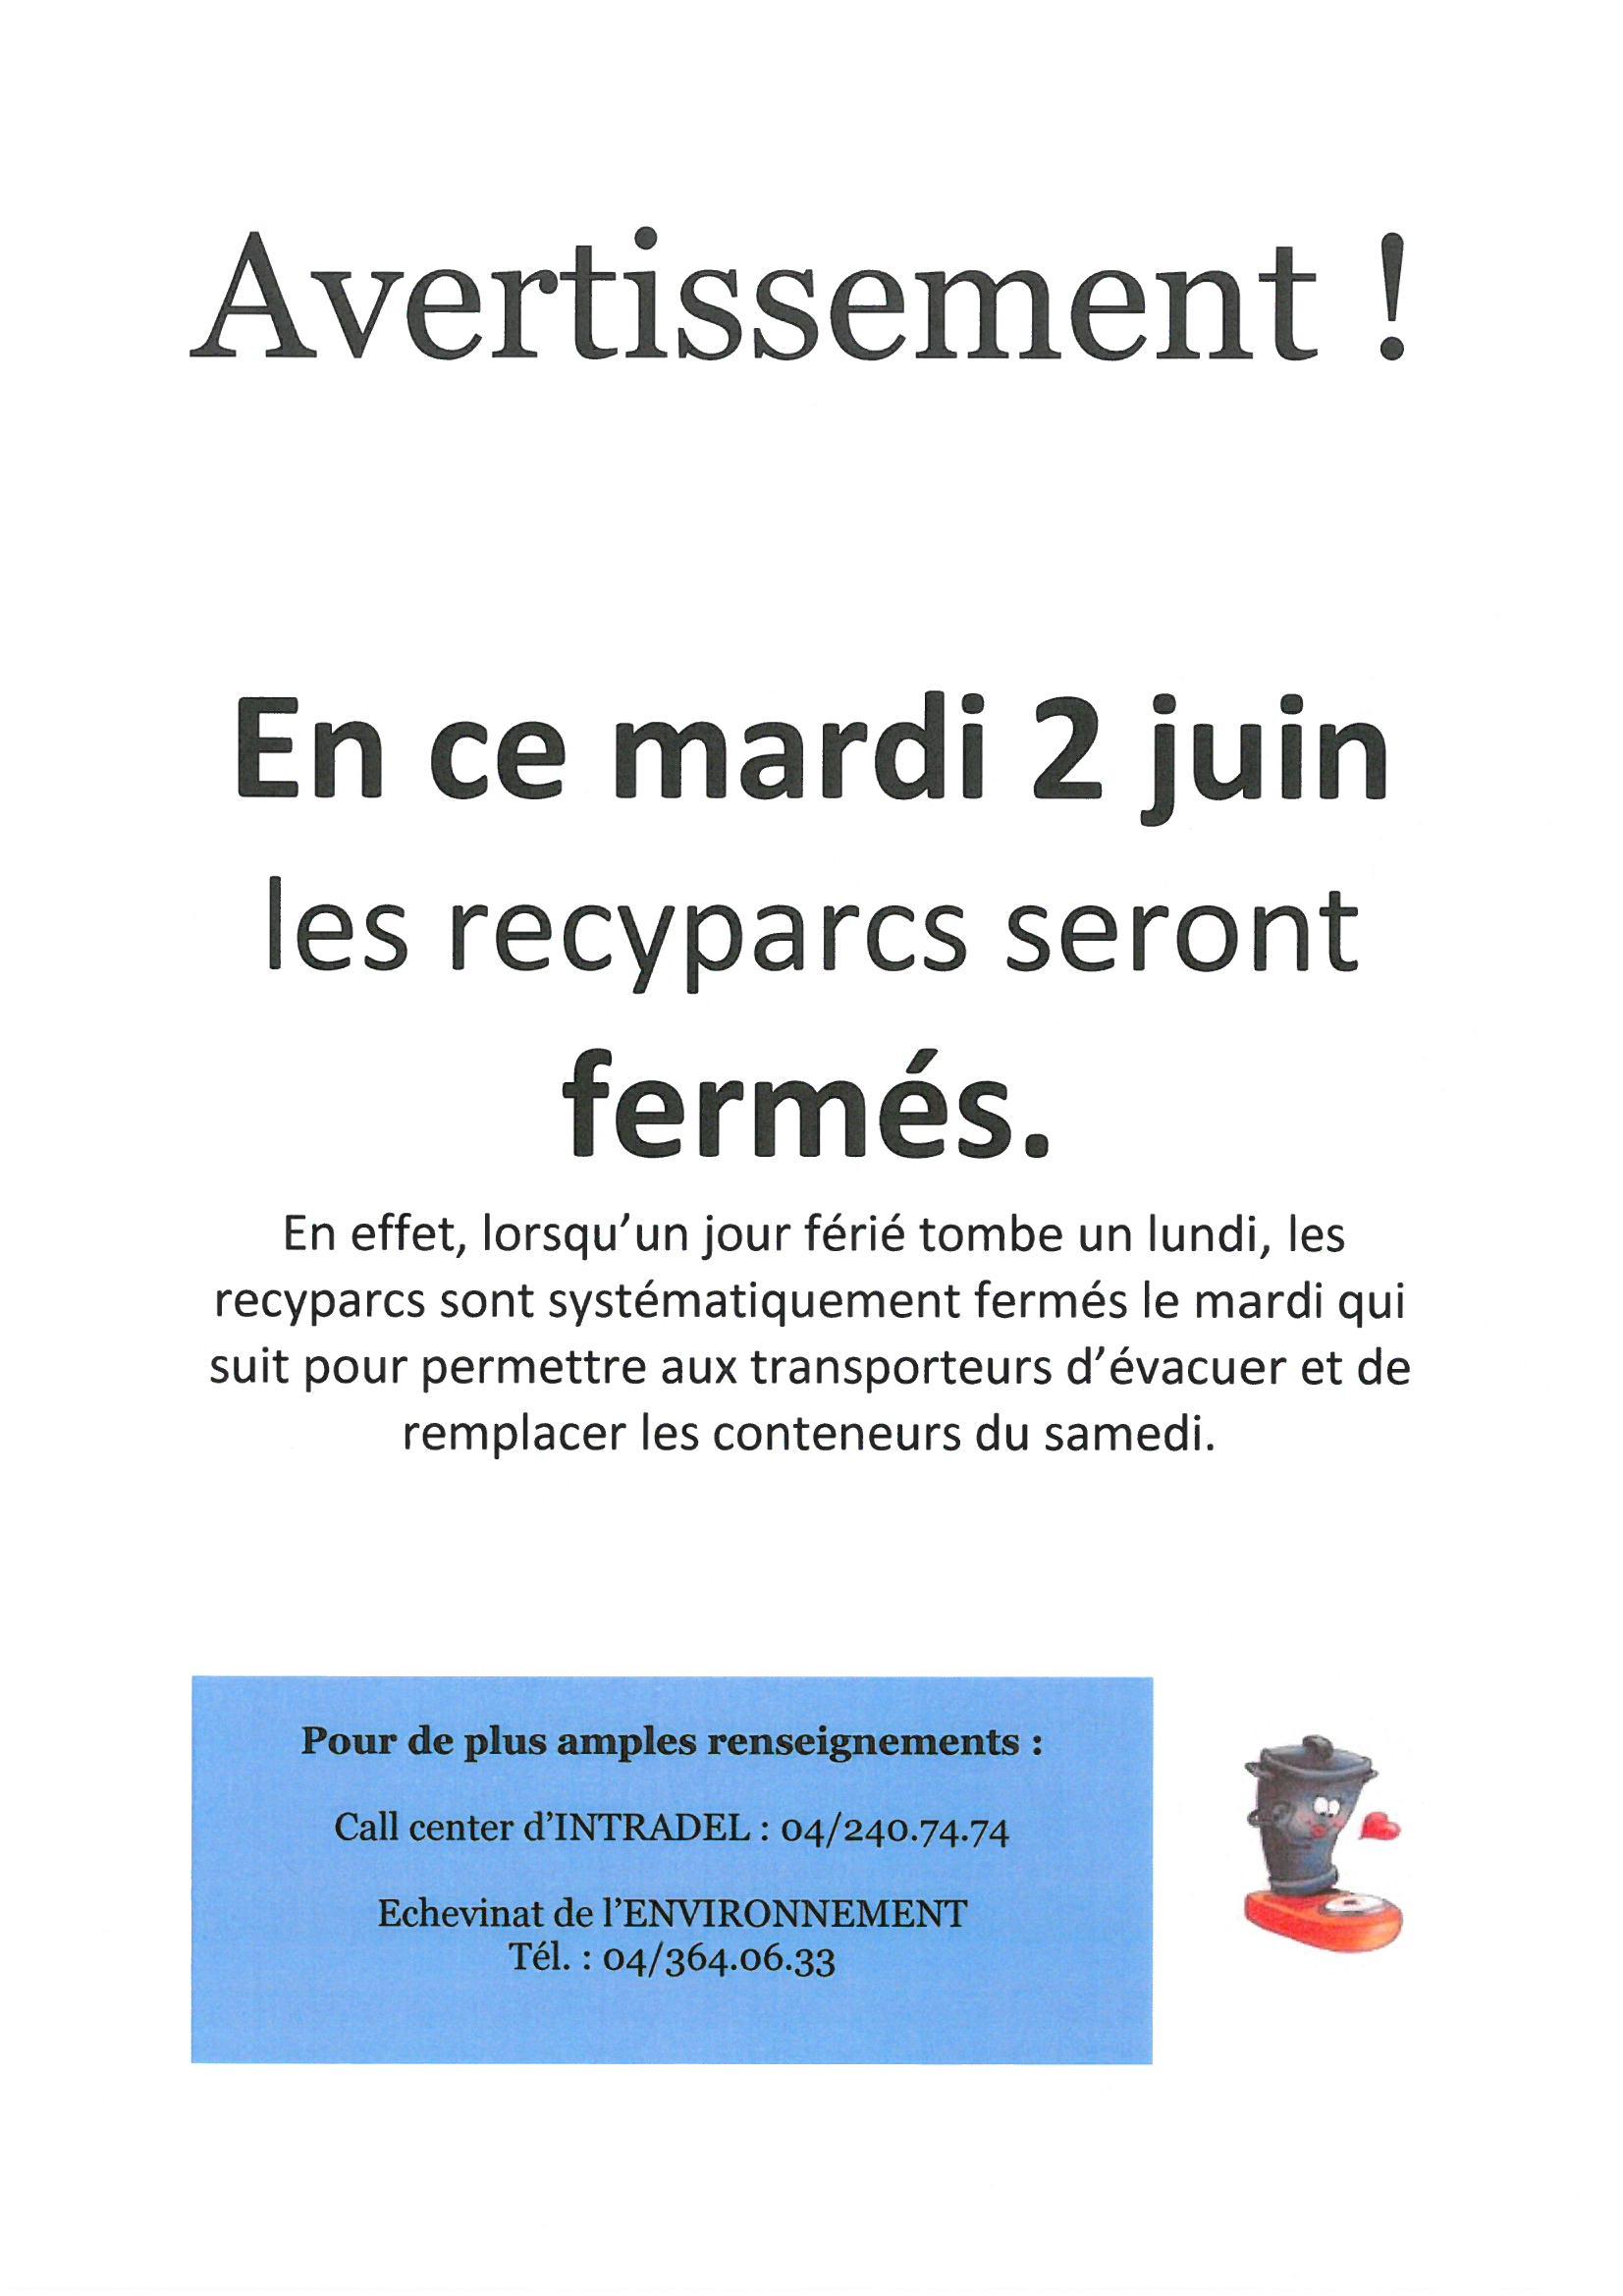 Fermeture des recyparcs - mardi 2 juin 2020